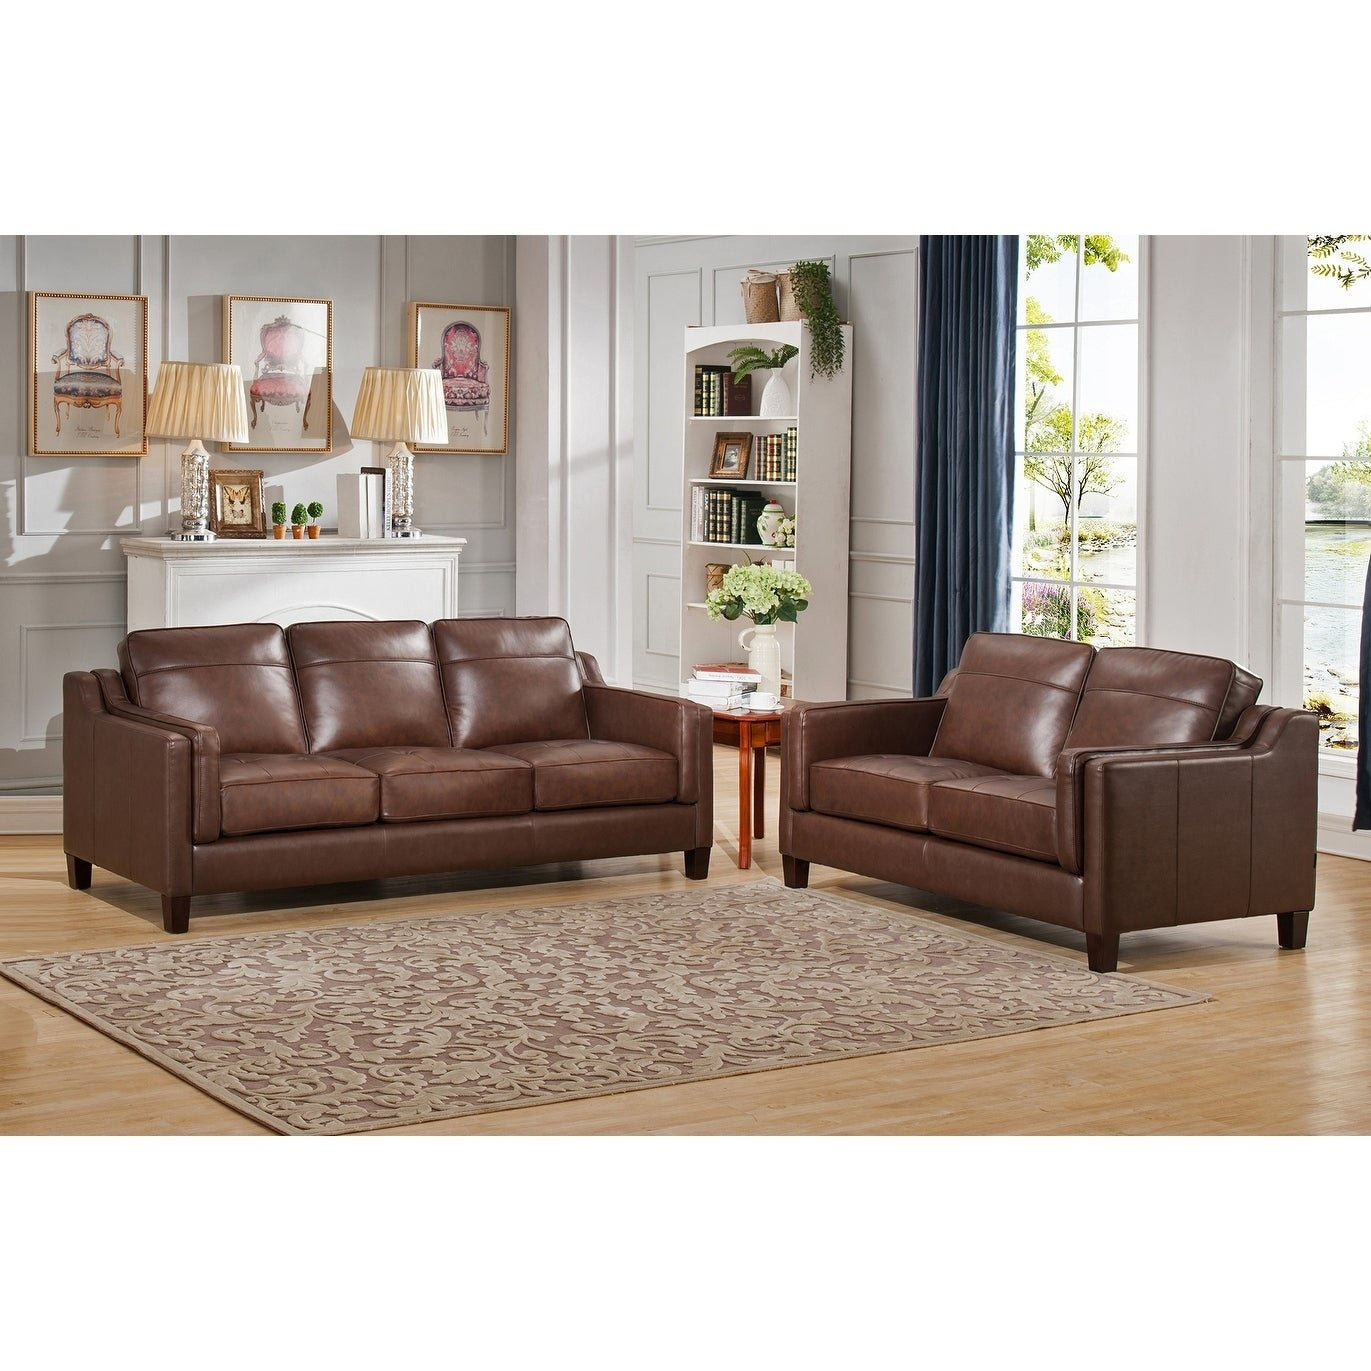 Hydeline By Amax Acorn Top Grain Leather Brown Sofa And Loveseat  ~ Brown Sofa And Loveseat Sets